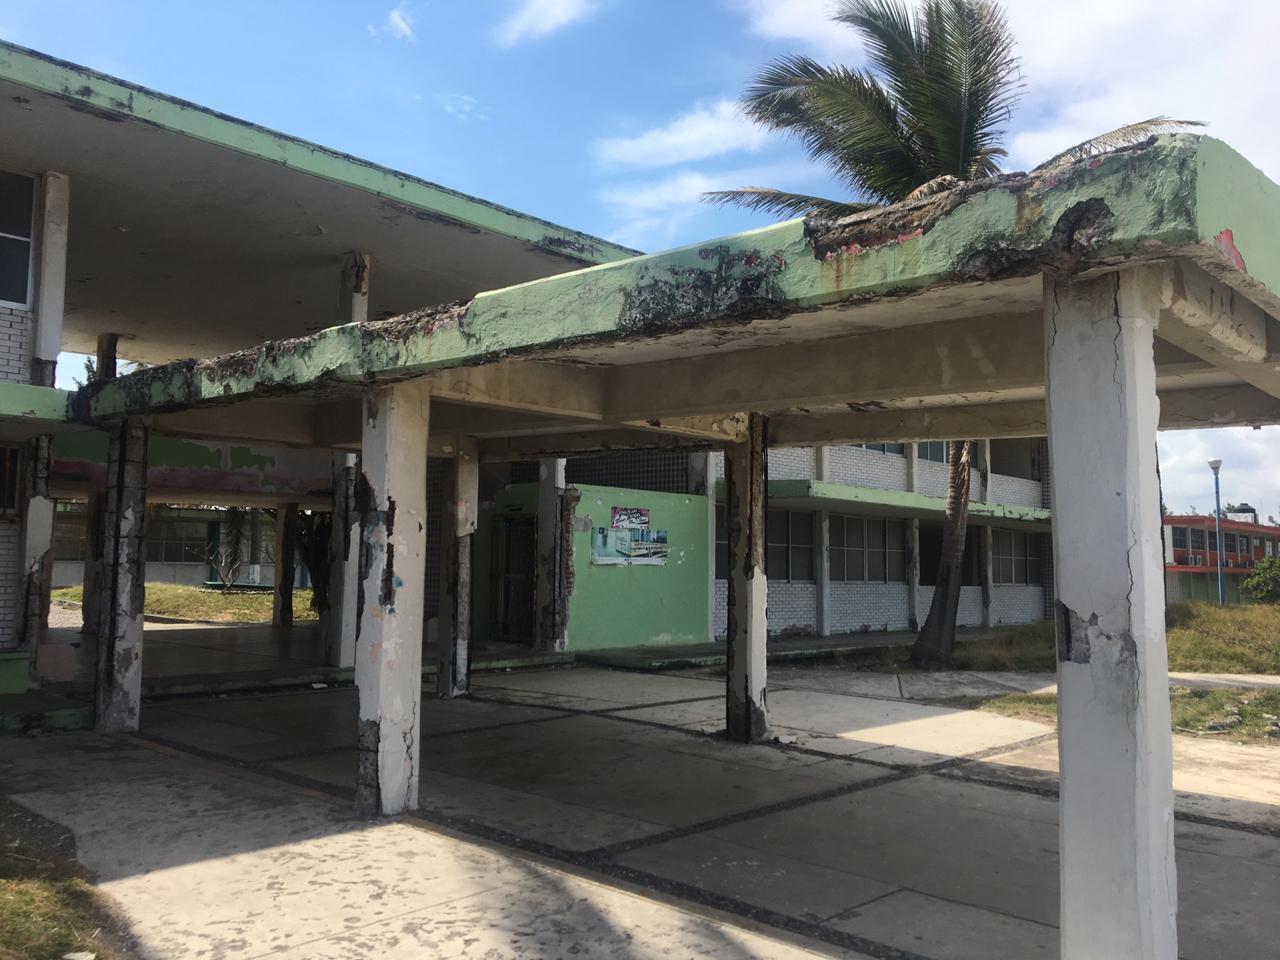 Imparten clases en ruinas del Instituto Ilustre Veracruzano